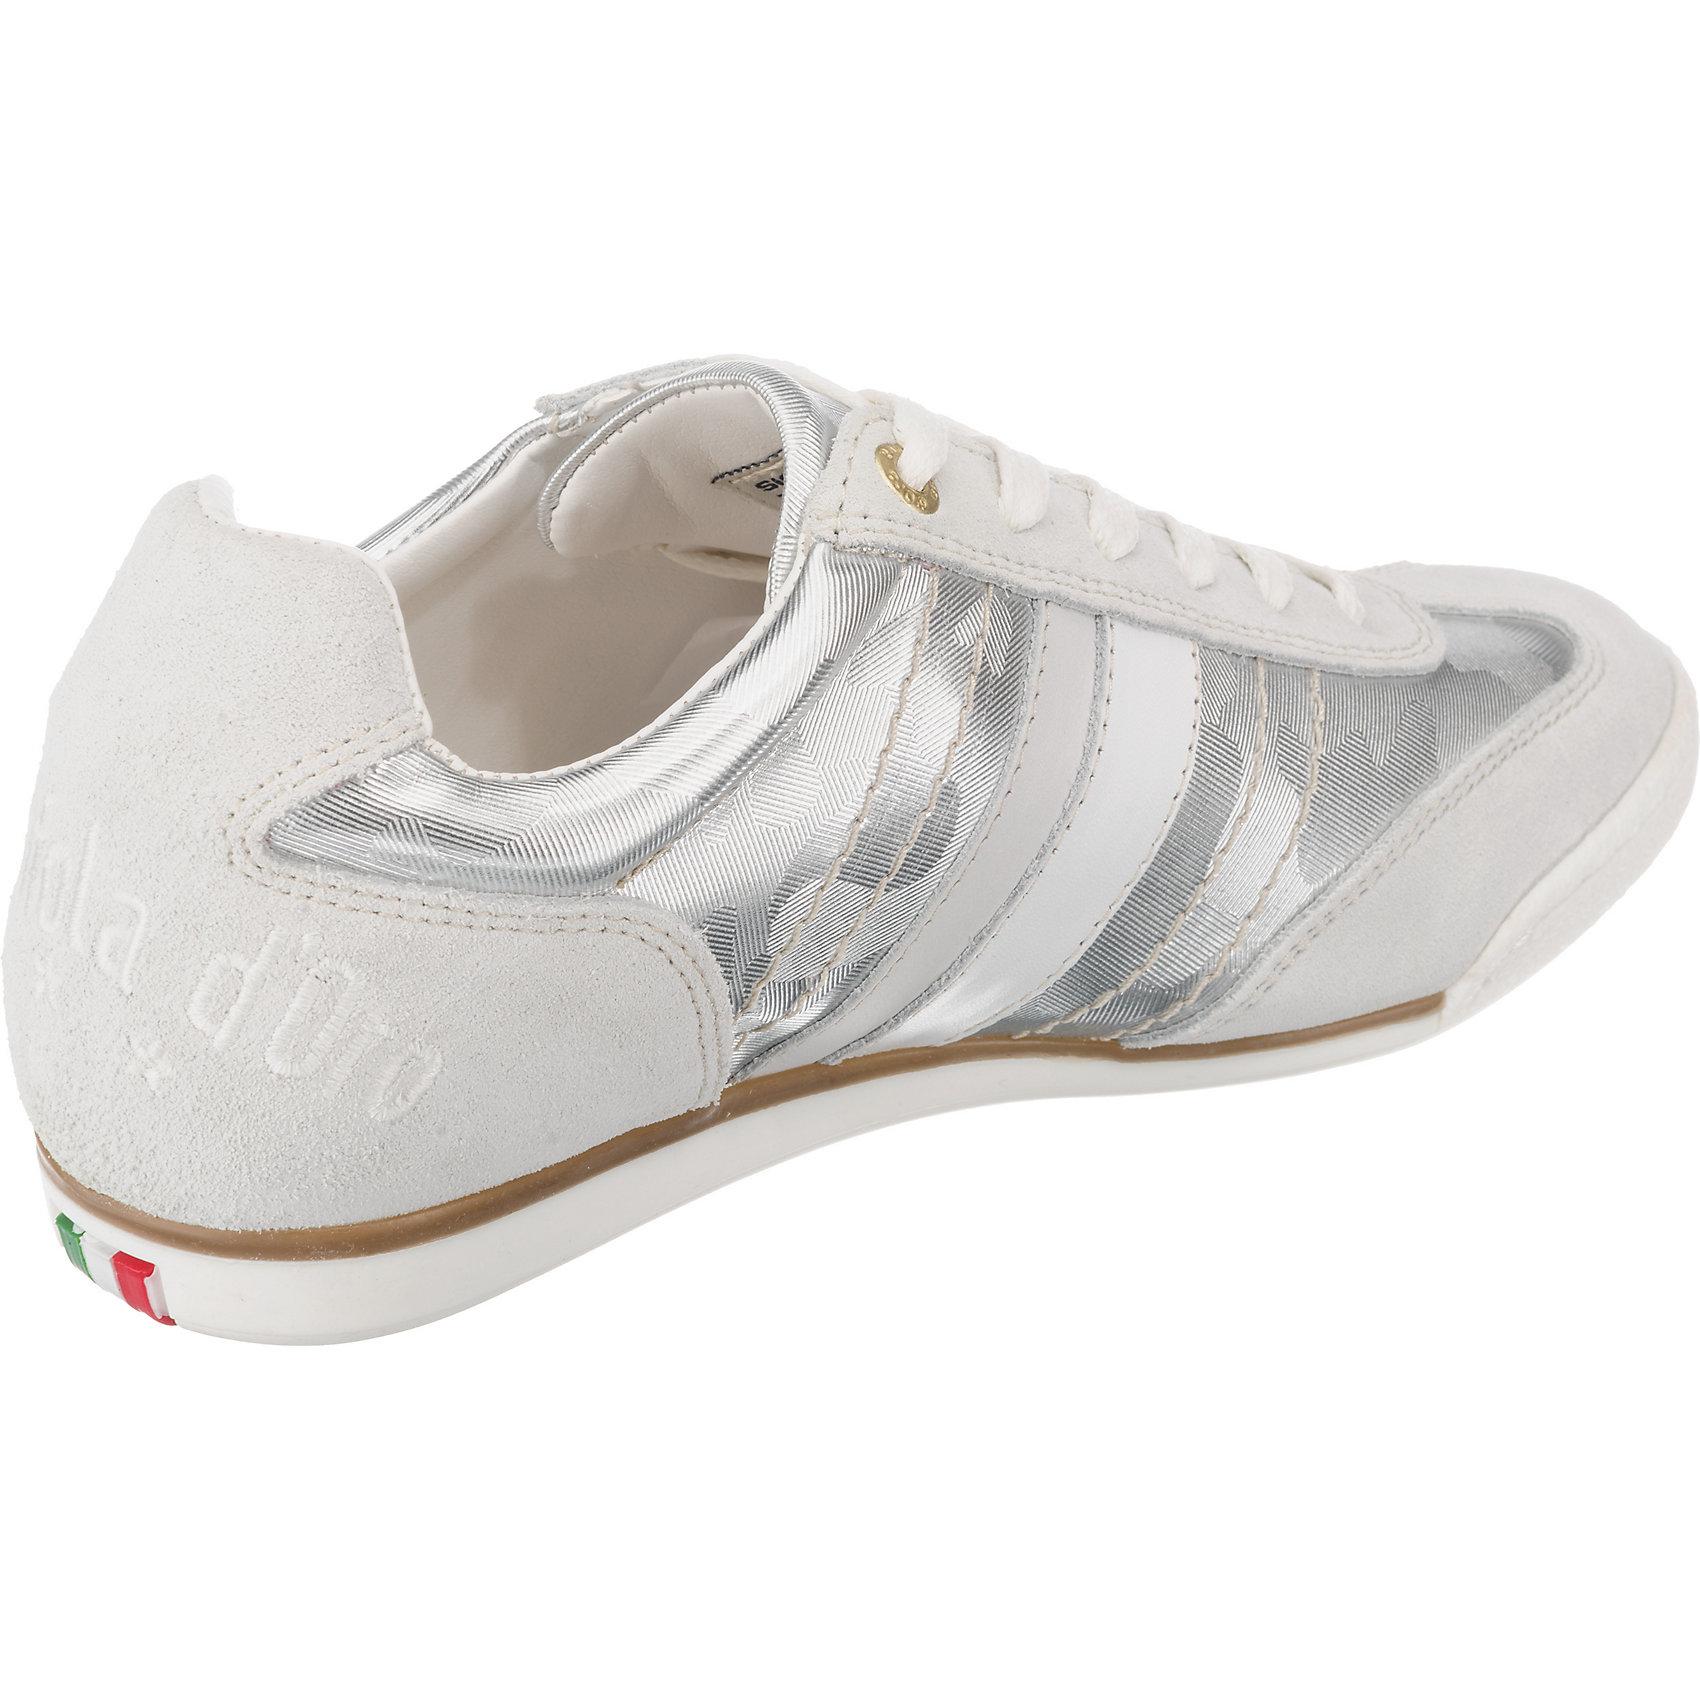 low cost 58d6a b9d0a ... Mens Nike SF AF1 QS 903270-778 Desert Desert Desert Ochre Brand New  Size 10 ...